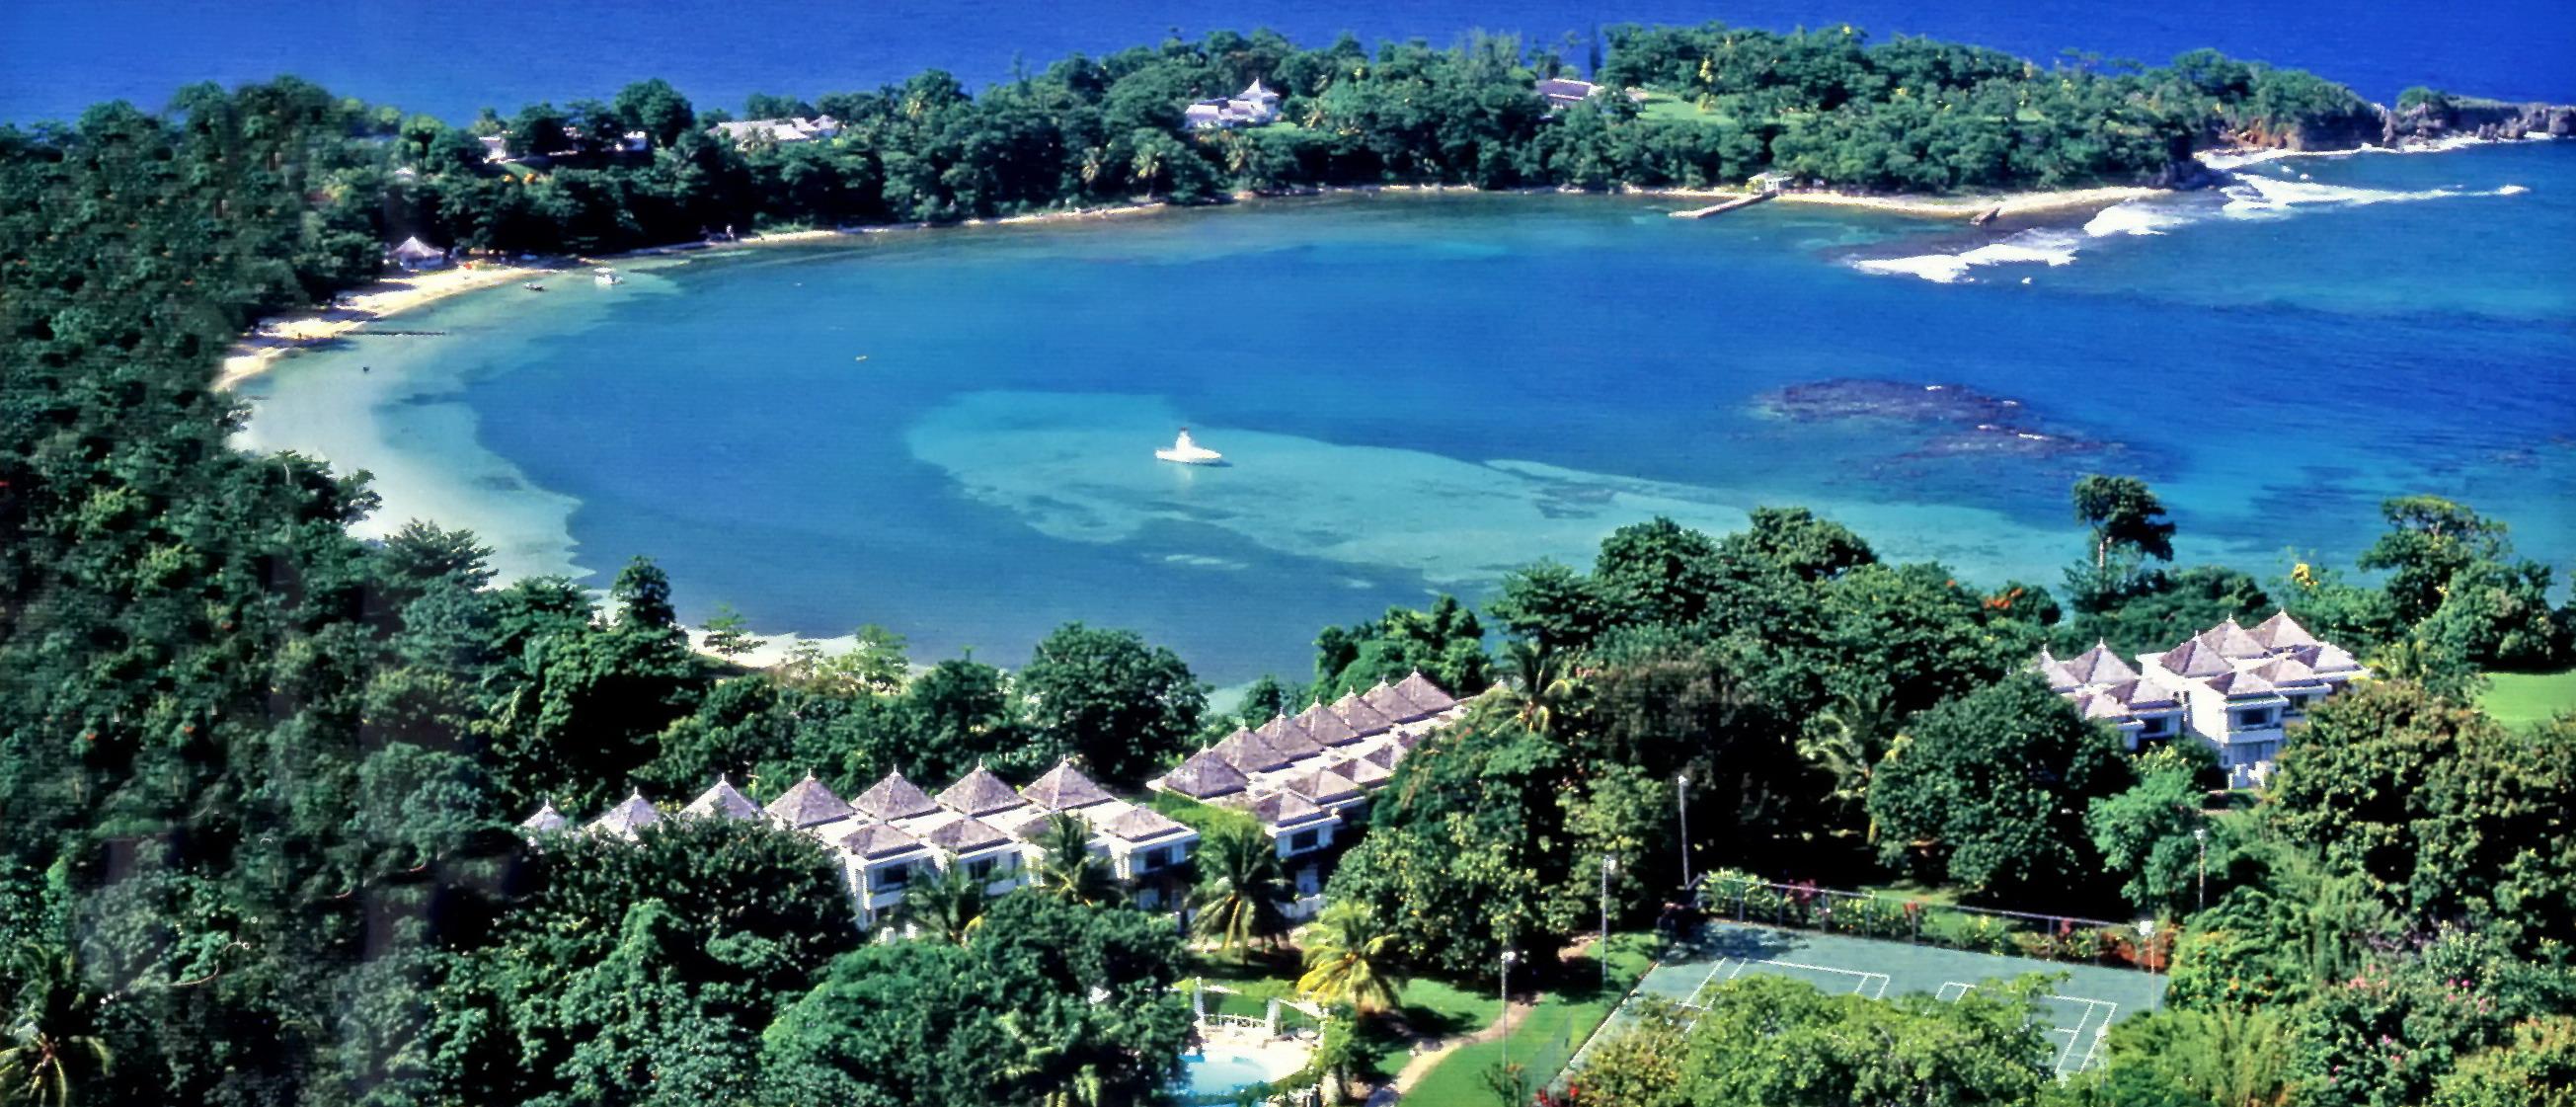 Port Antonio Jamaica  city images : Underland Oddity